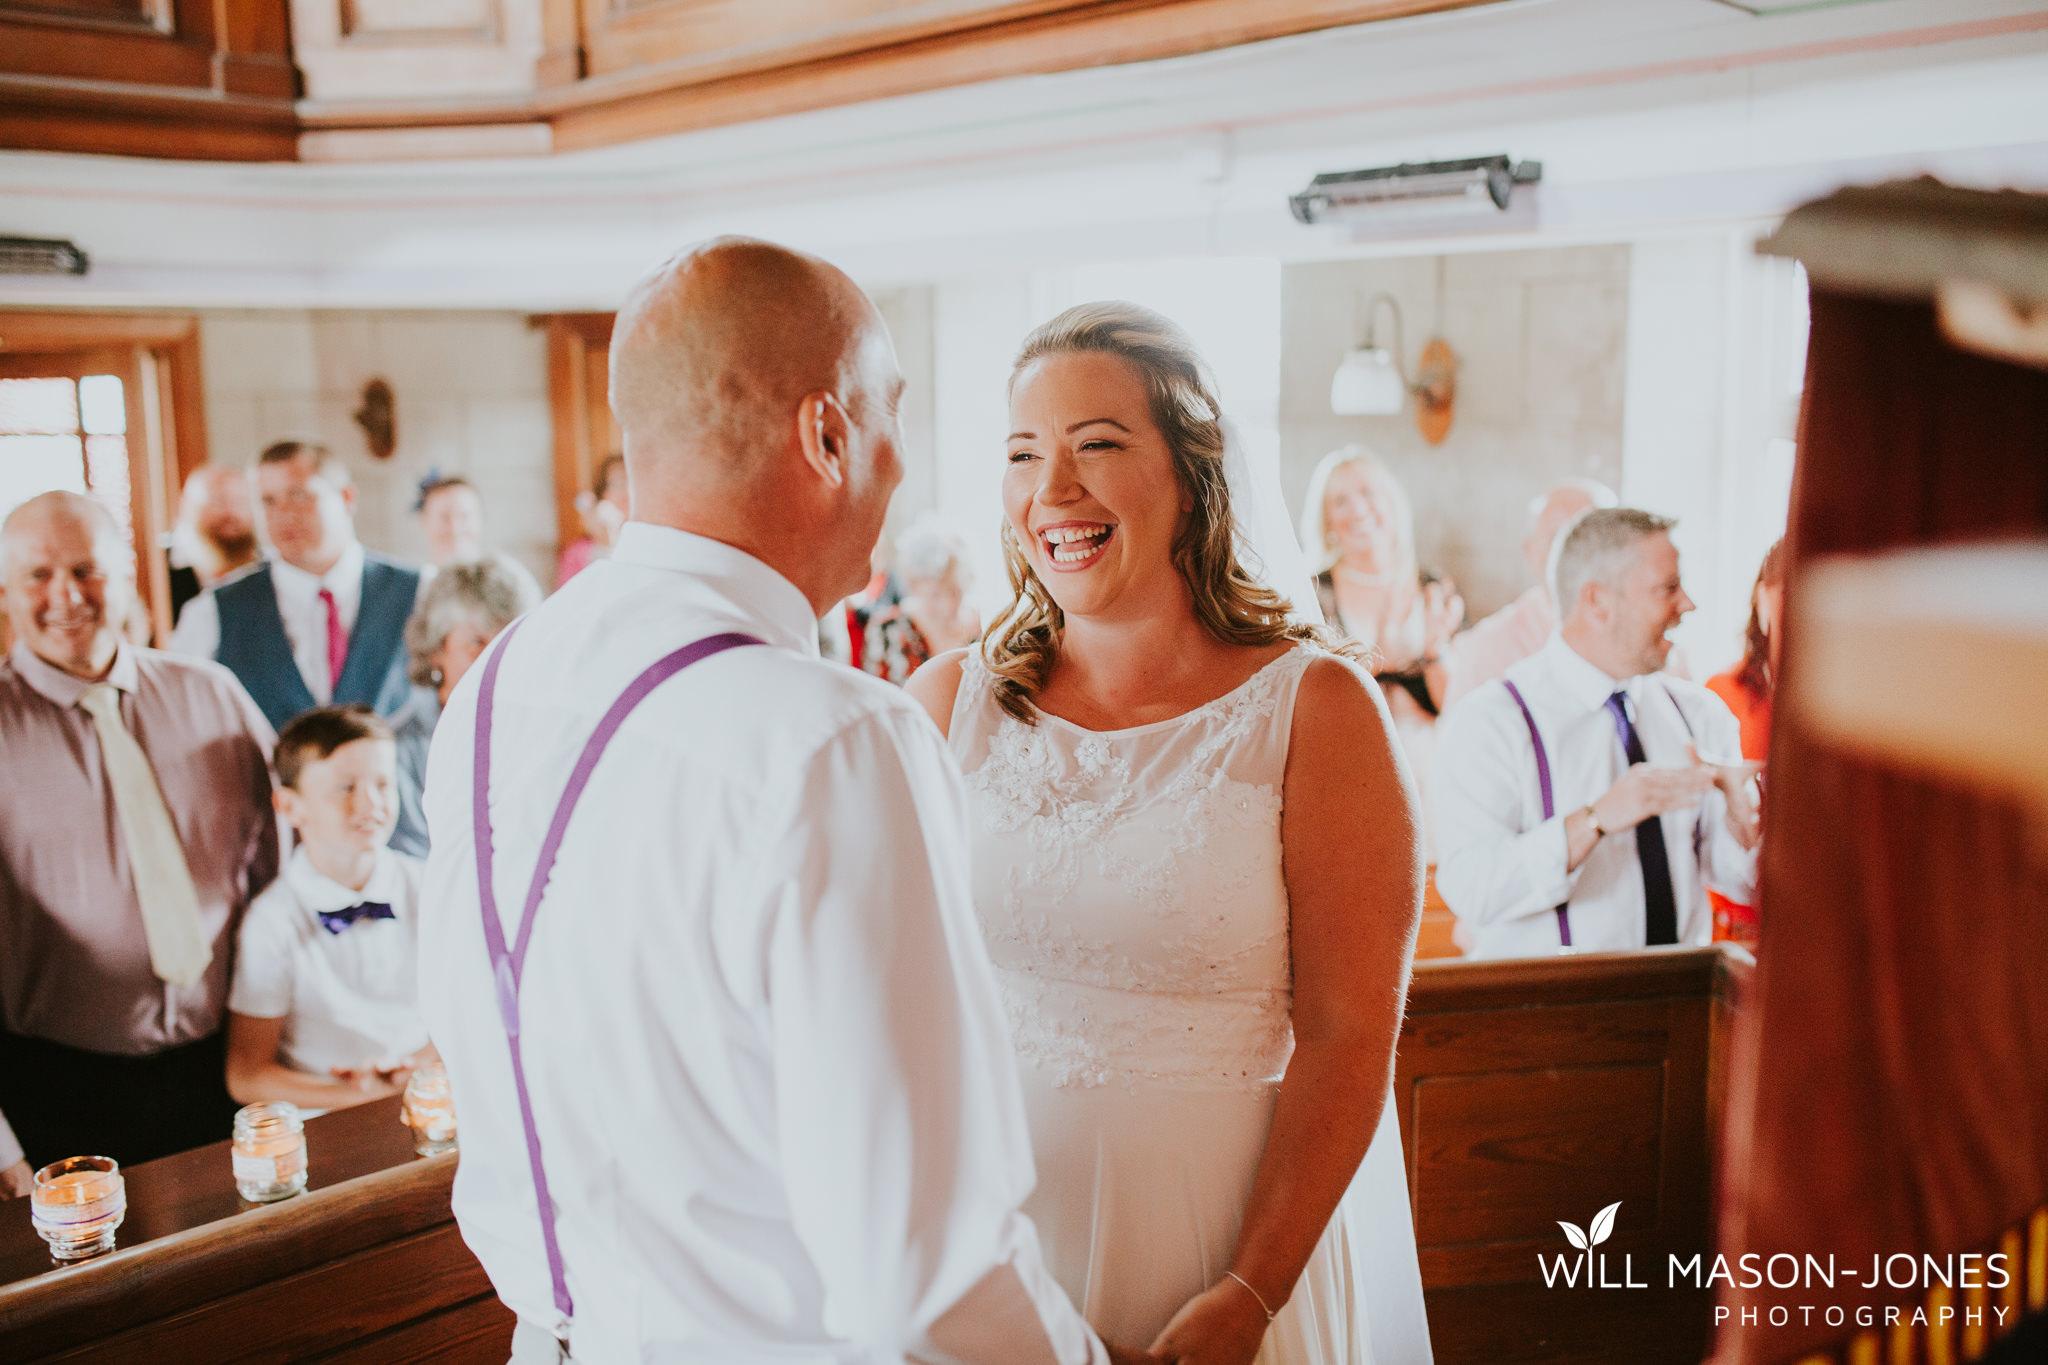 small-intimate-chapel-wedding-swansea-photographs-8.jpg